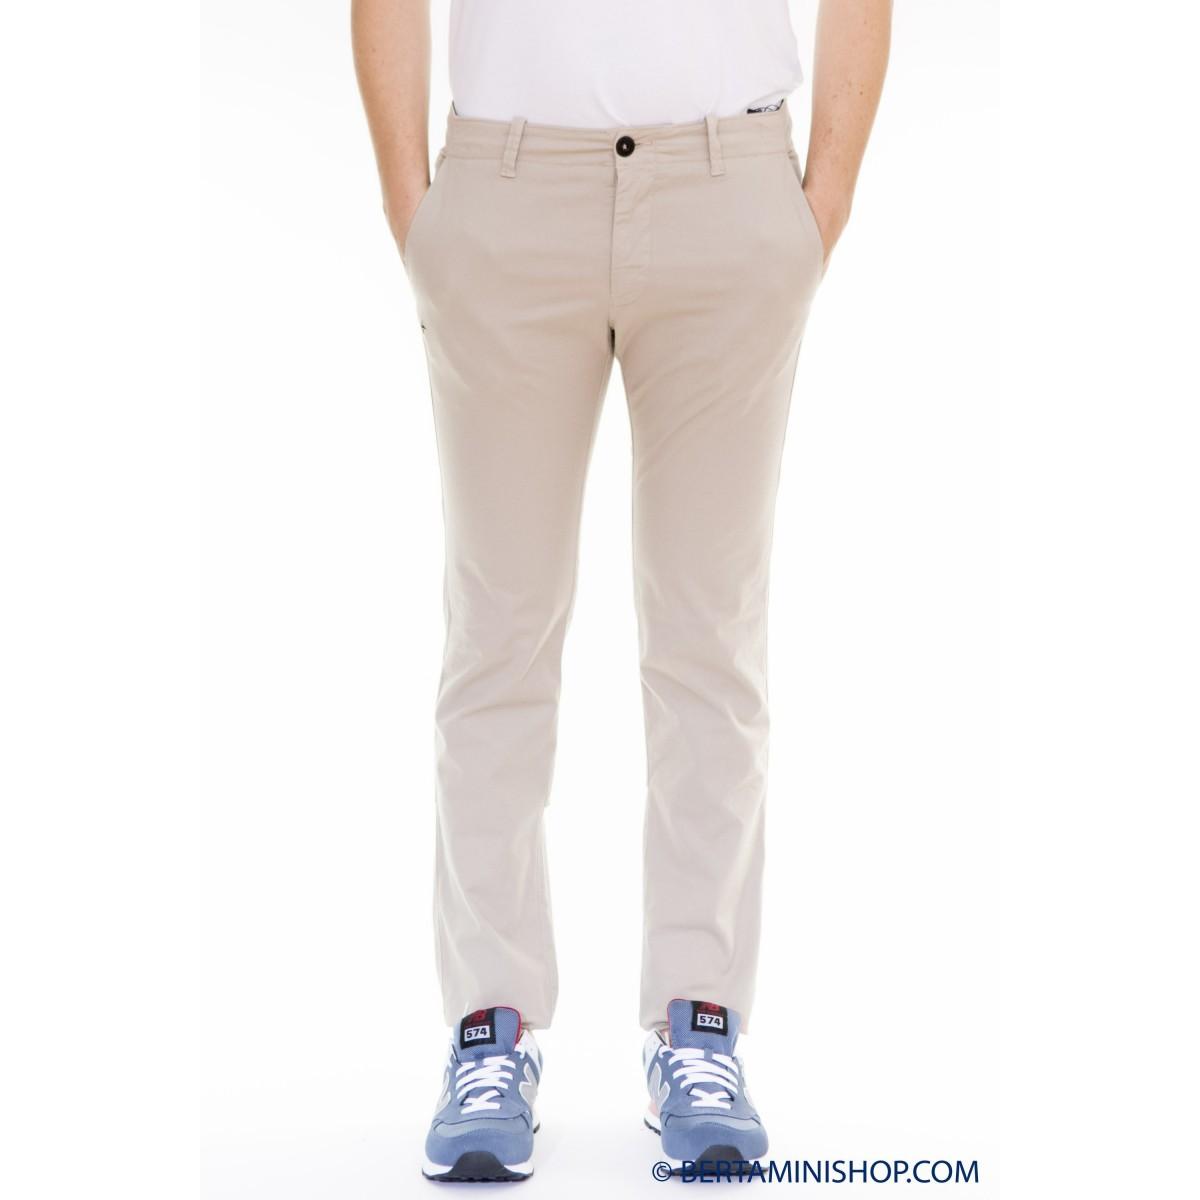 Pantalone uomo Stone island - 3czjm gabardine strech skinny V0095 - Sabbia